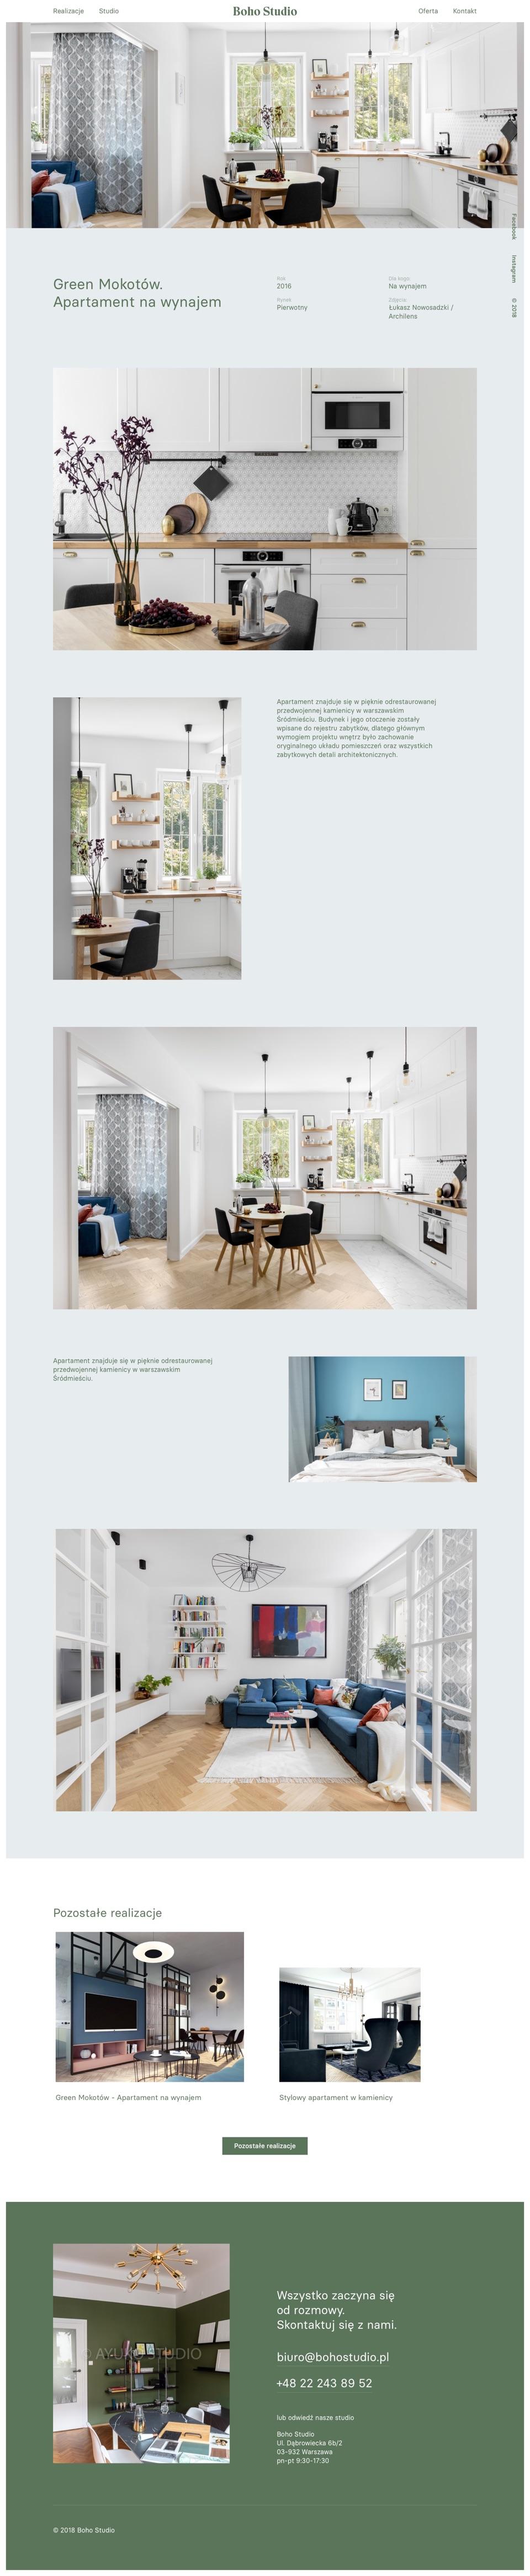 Poster design - Eufonie Festival by Uniforma